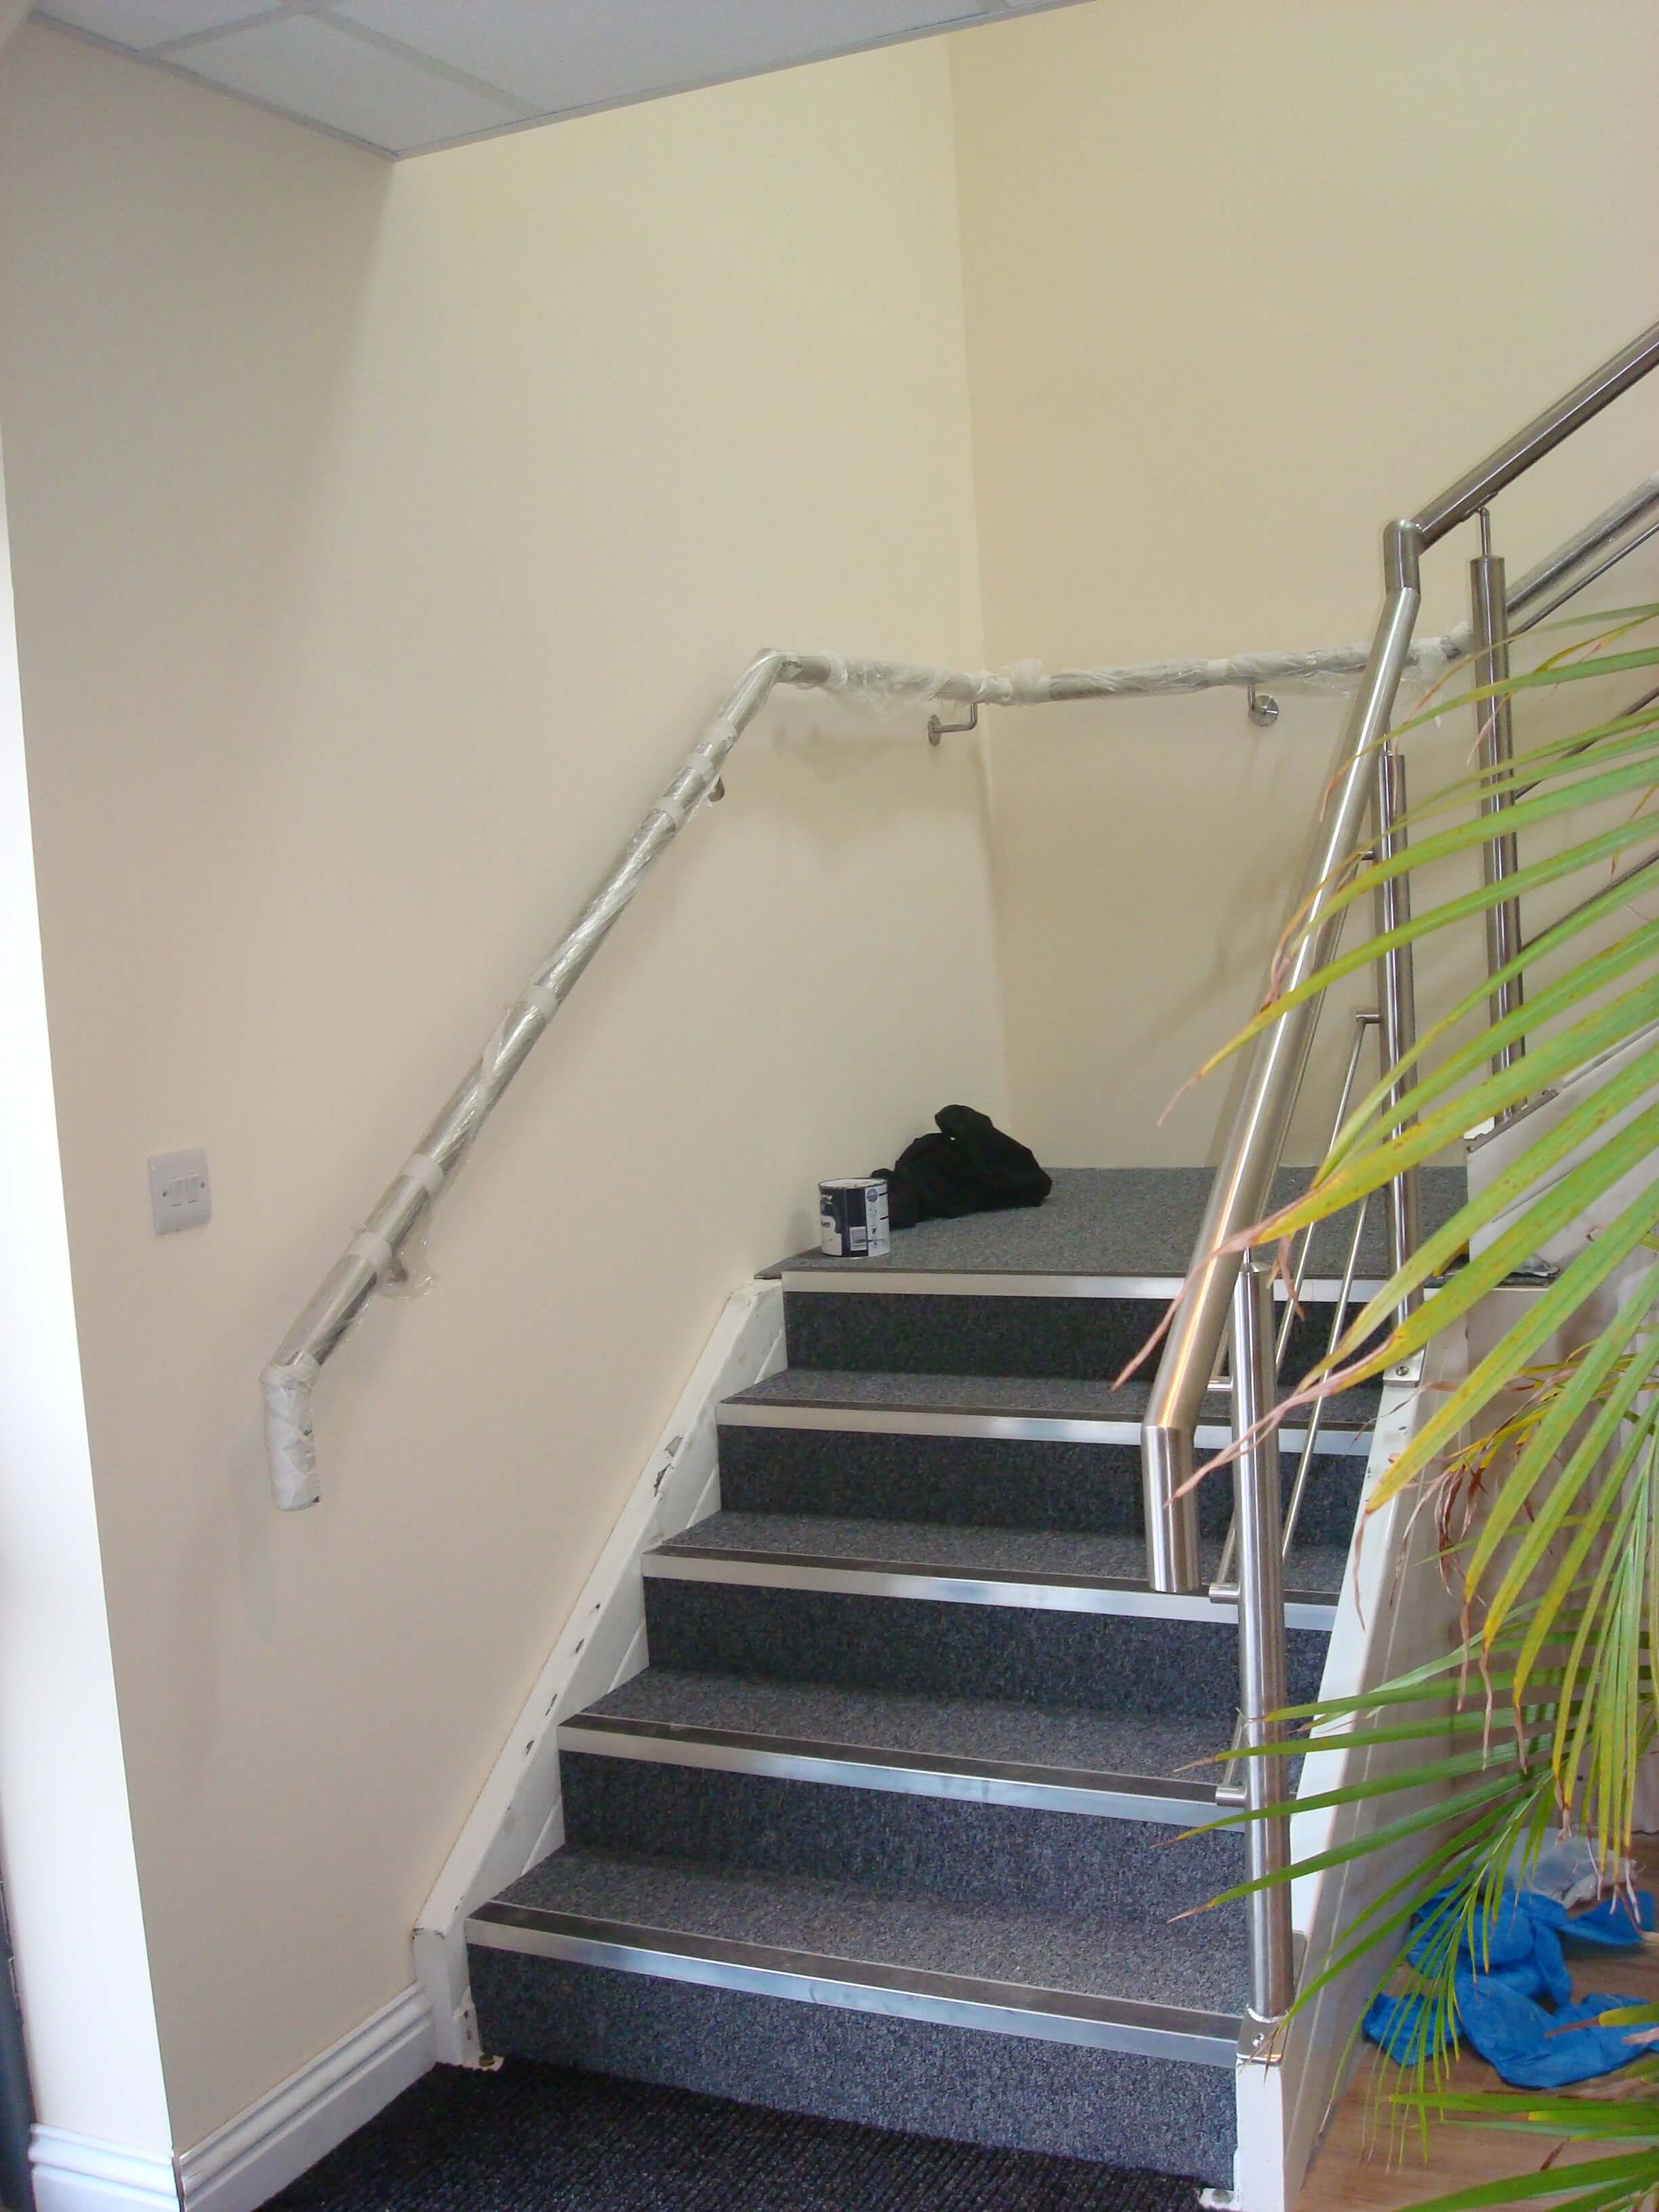 Nice new stairs